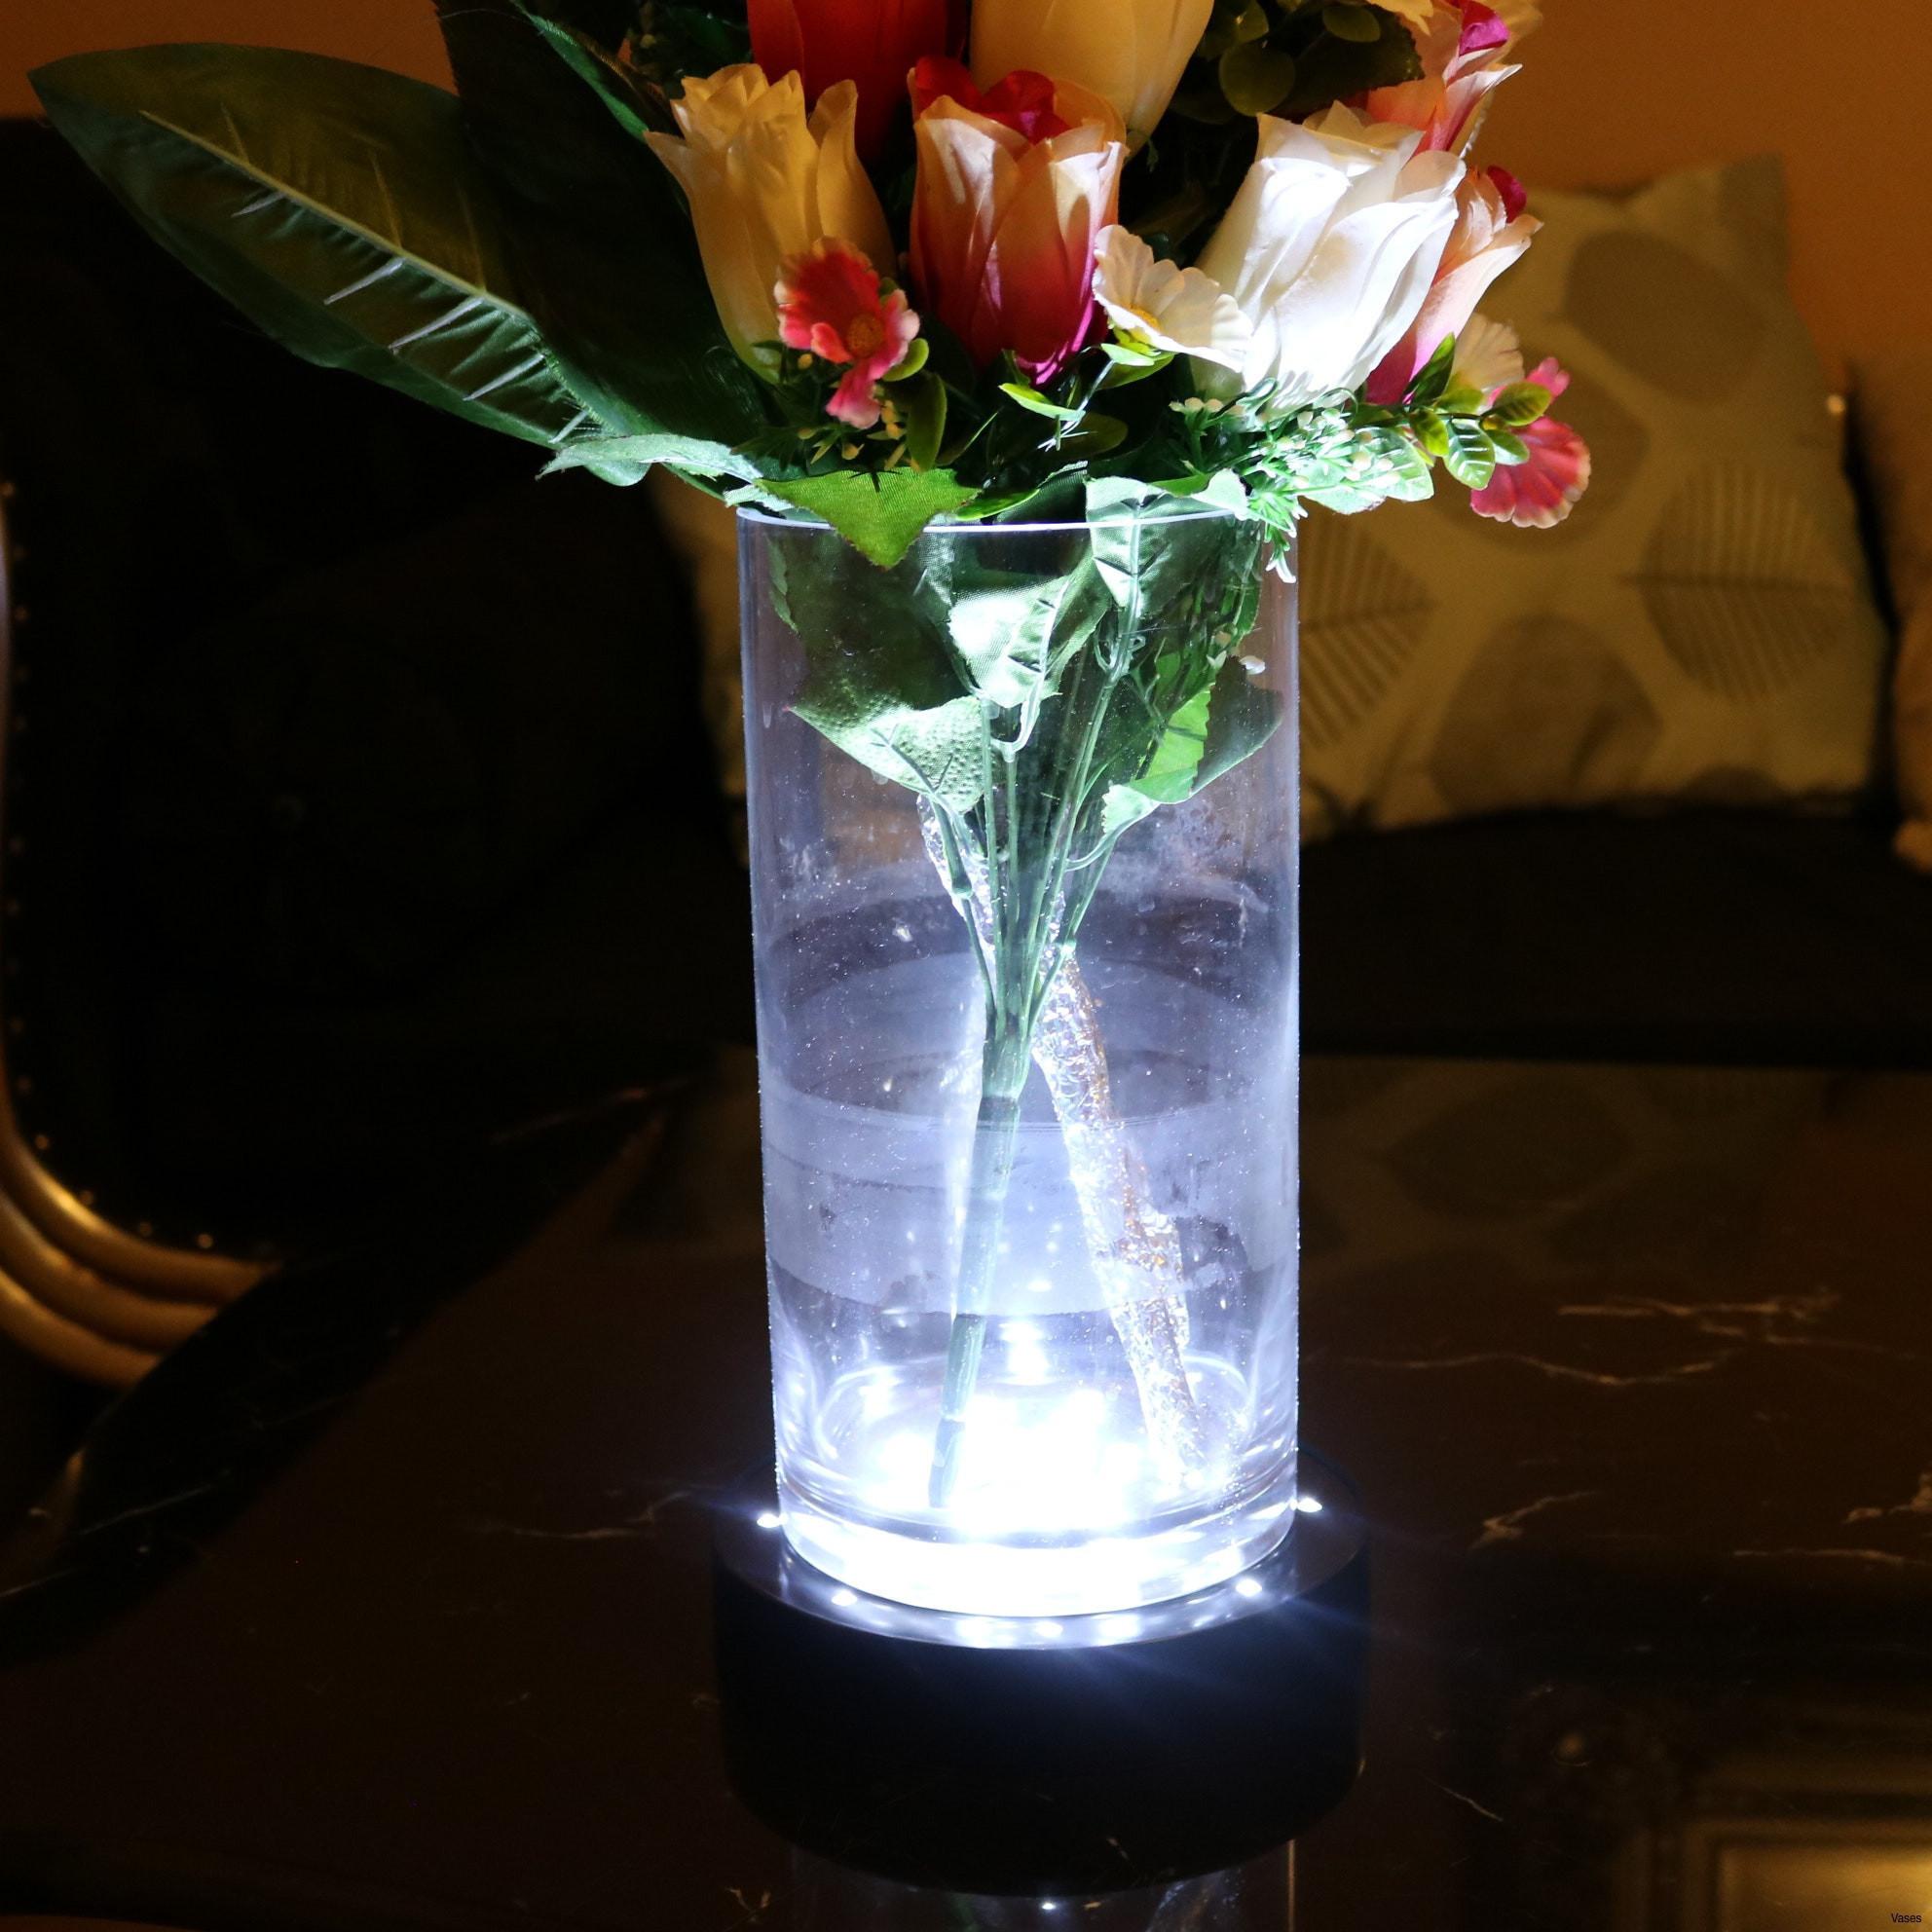 single flower in vase Image